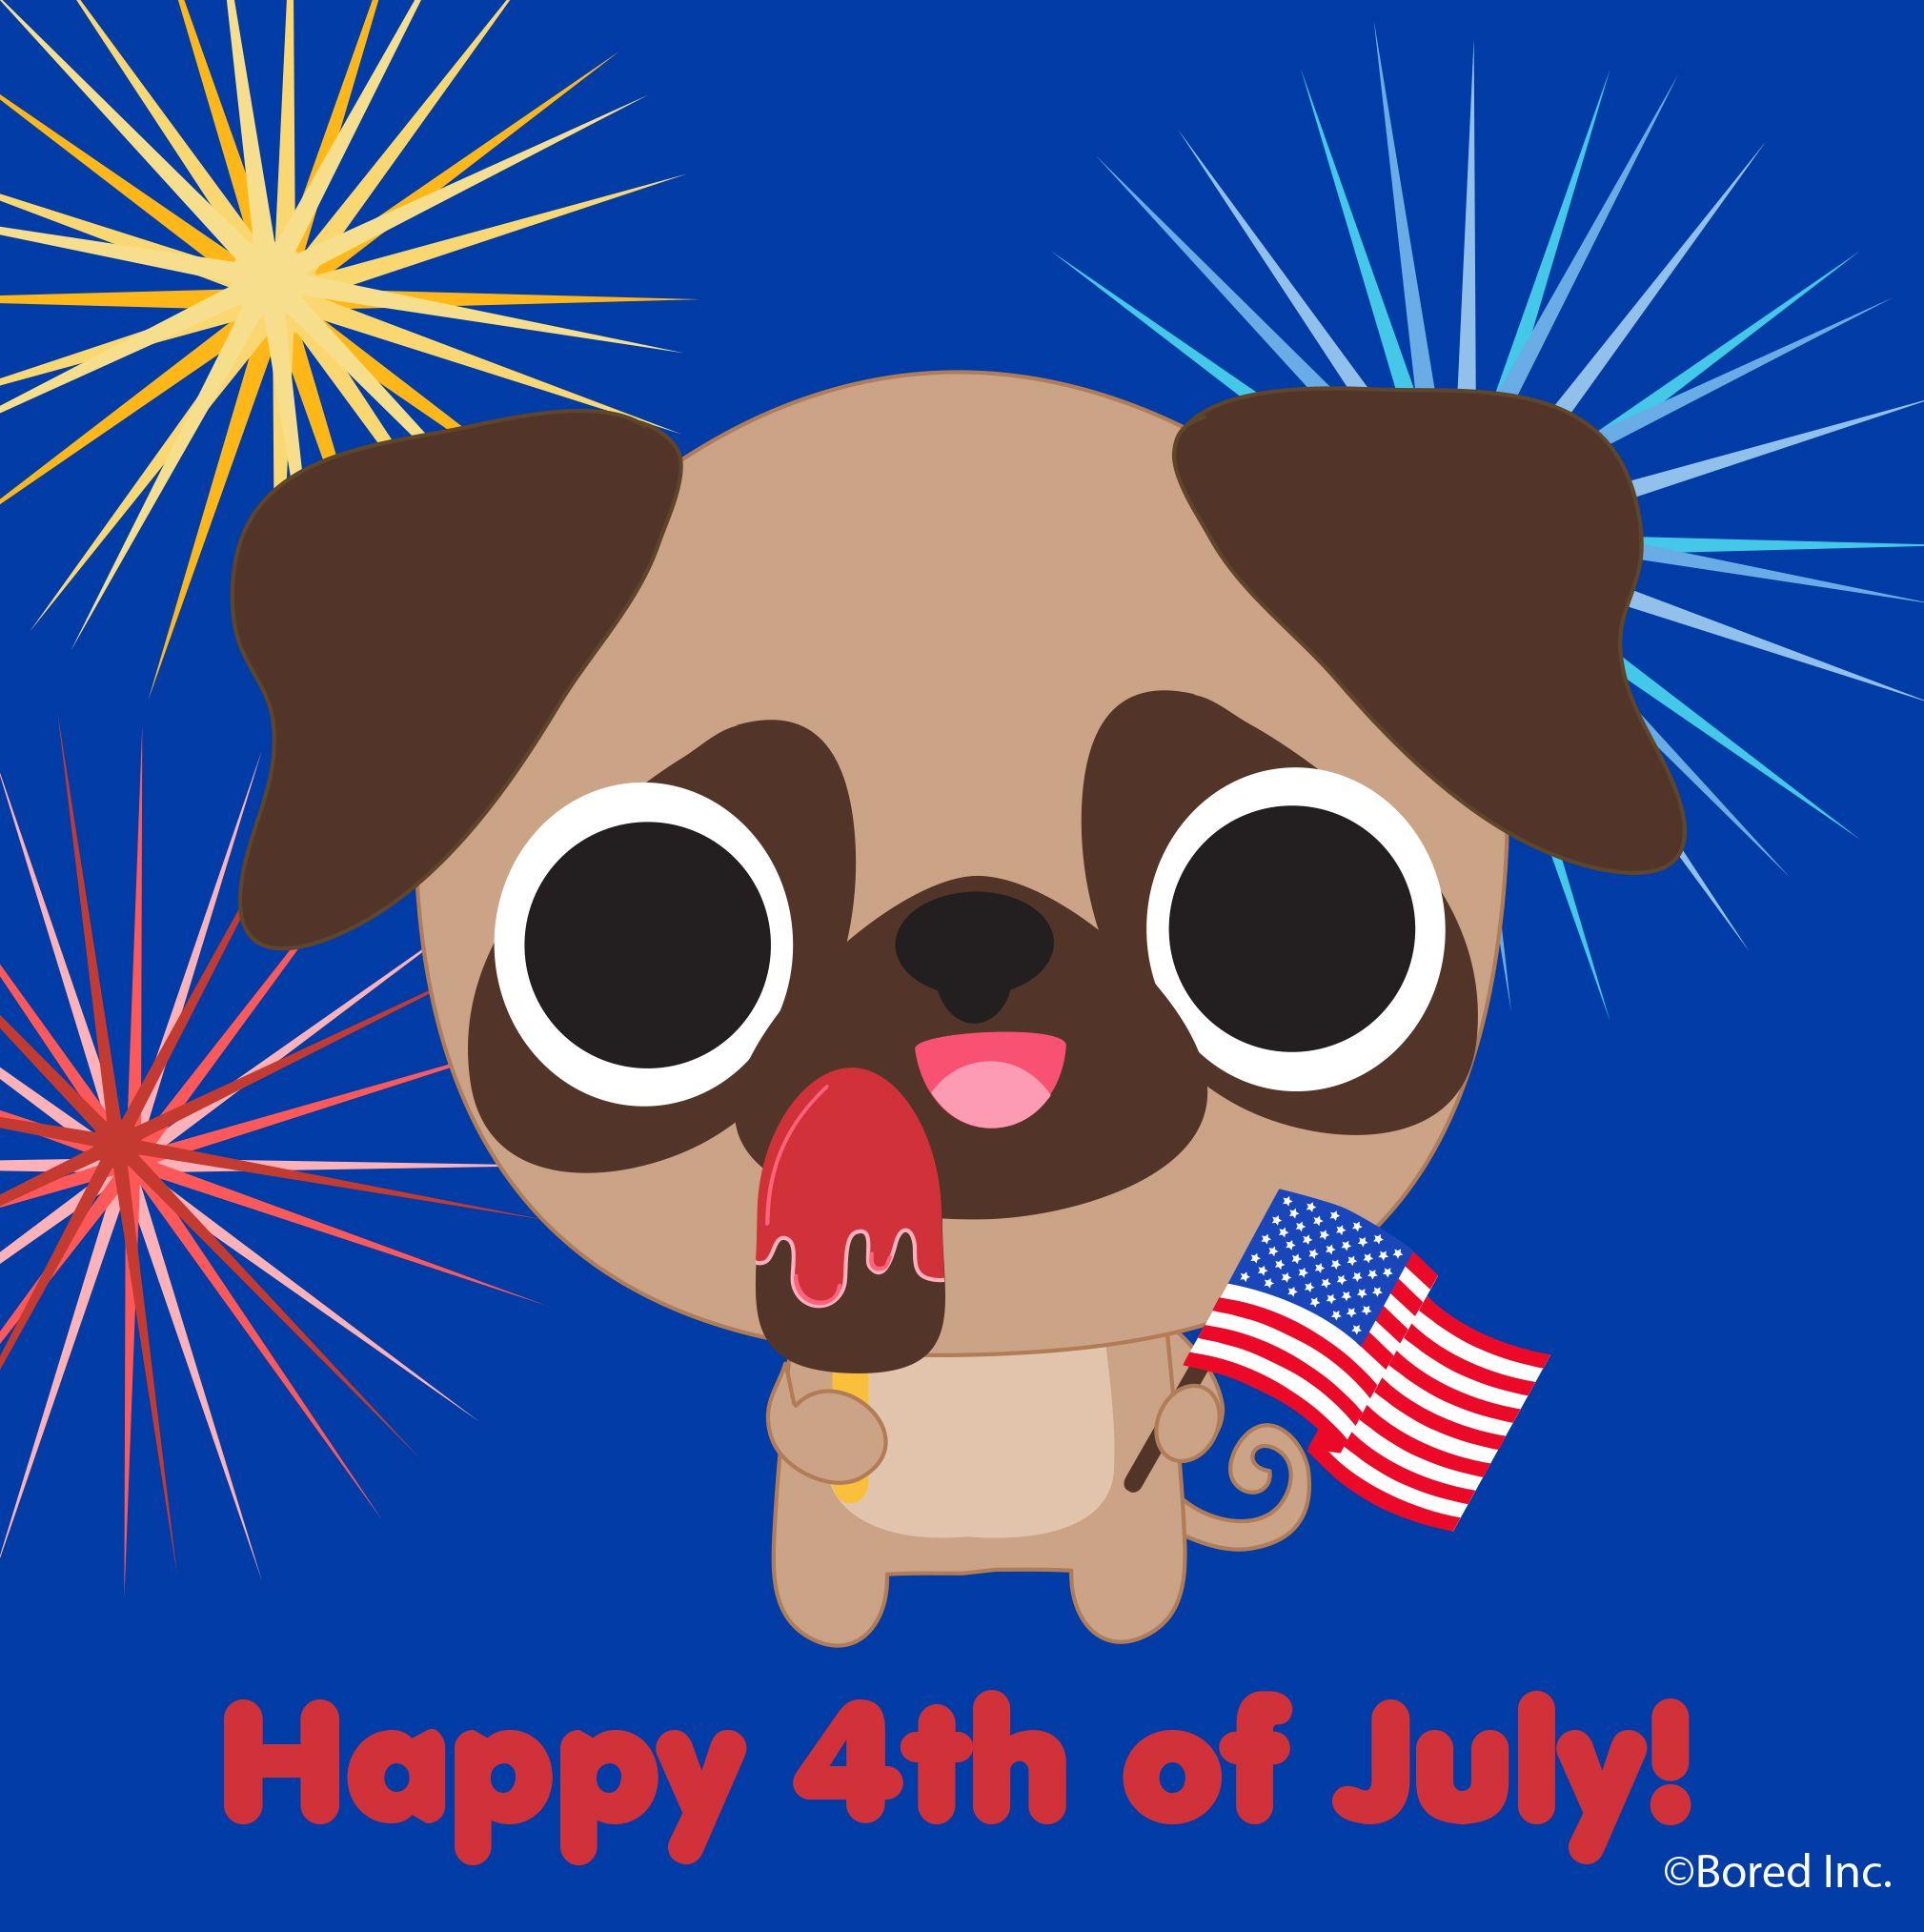 Happy 4th of july boredinc kawaii pug independenceday happy 4th of july boredinc kawaii pug independenceday 4thofjuly kristyandbryce Gallery